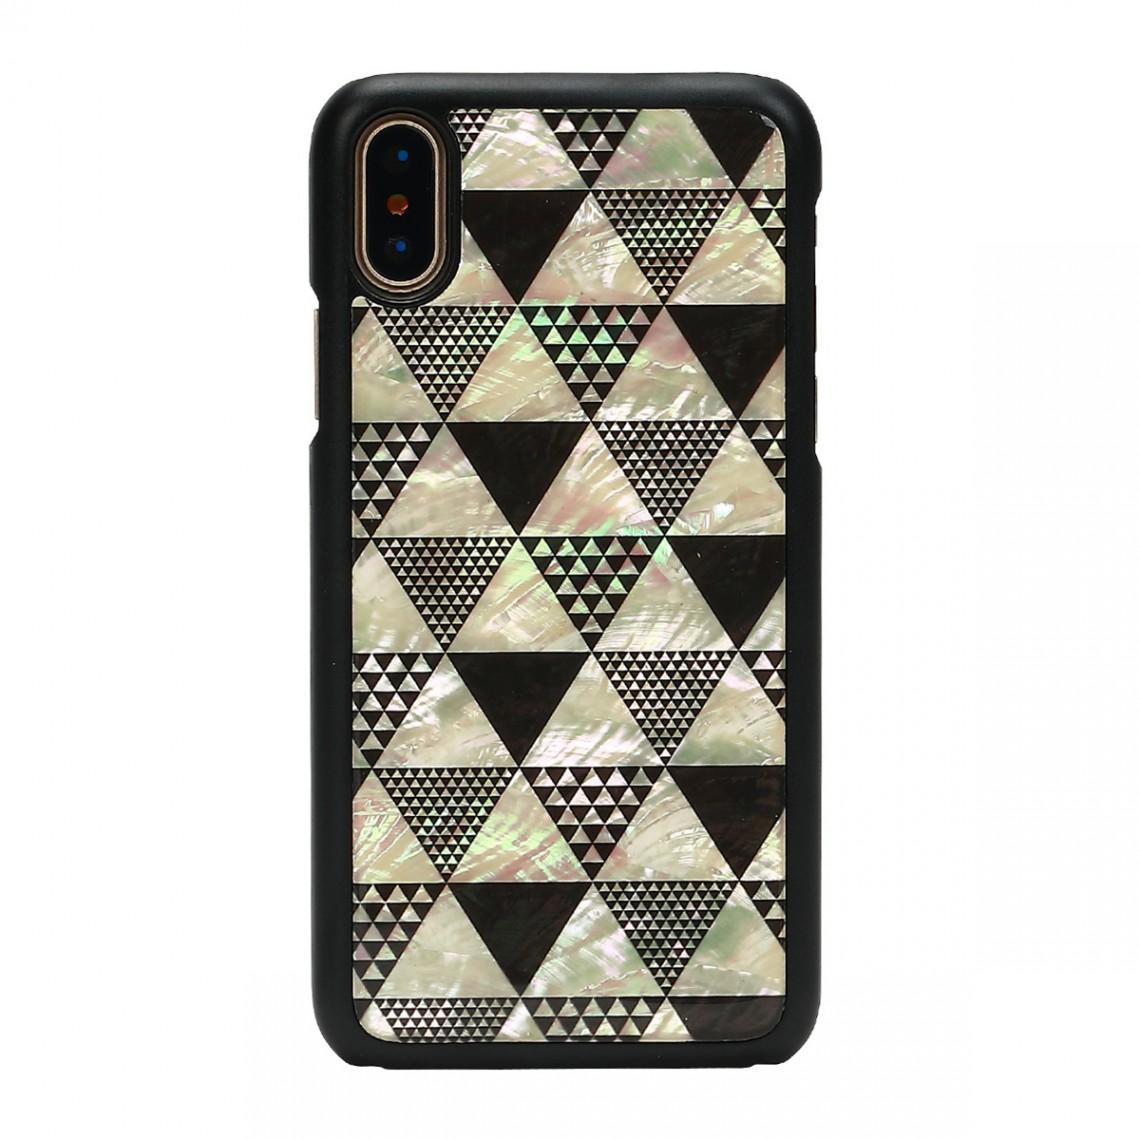 iPhone XS Max 天然貝 ケース ikins Pyramid